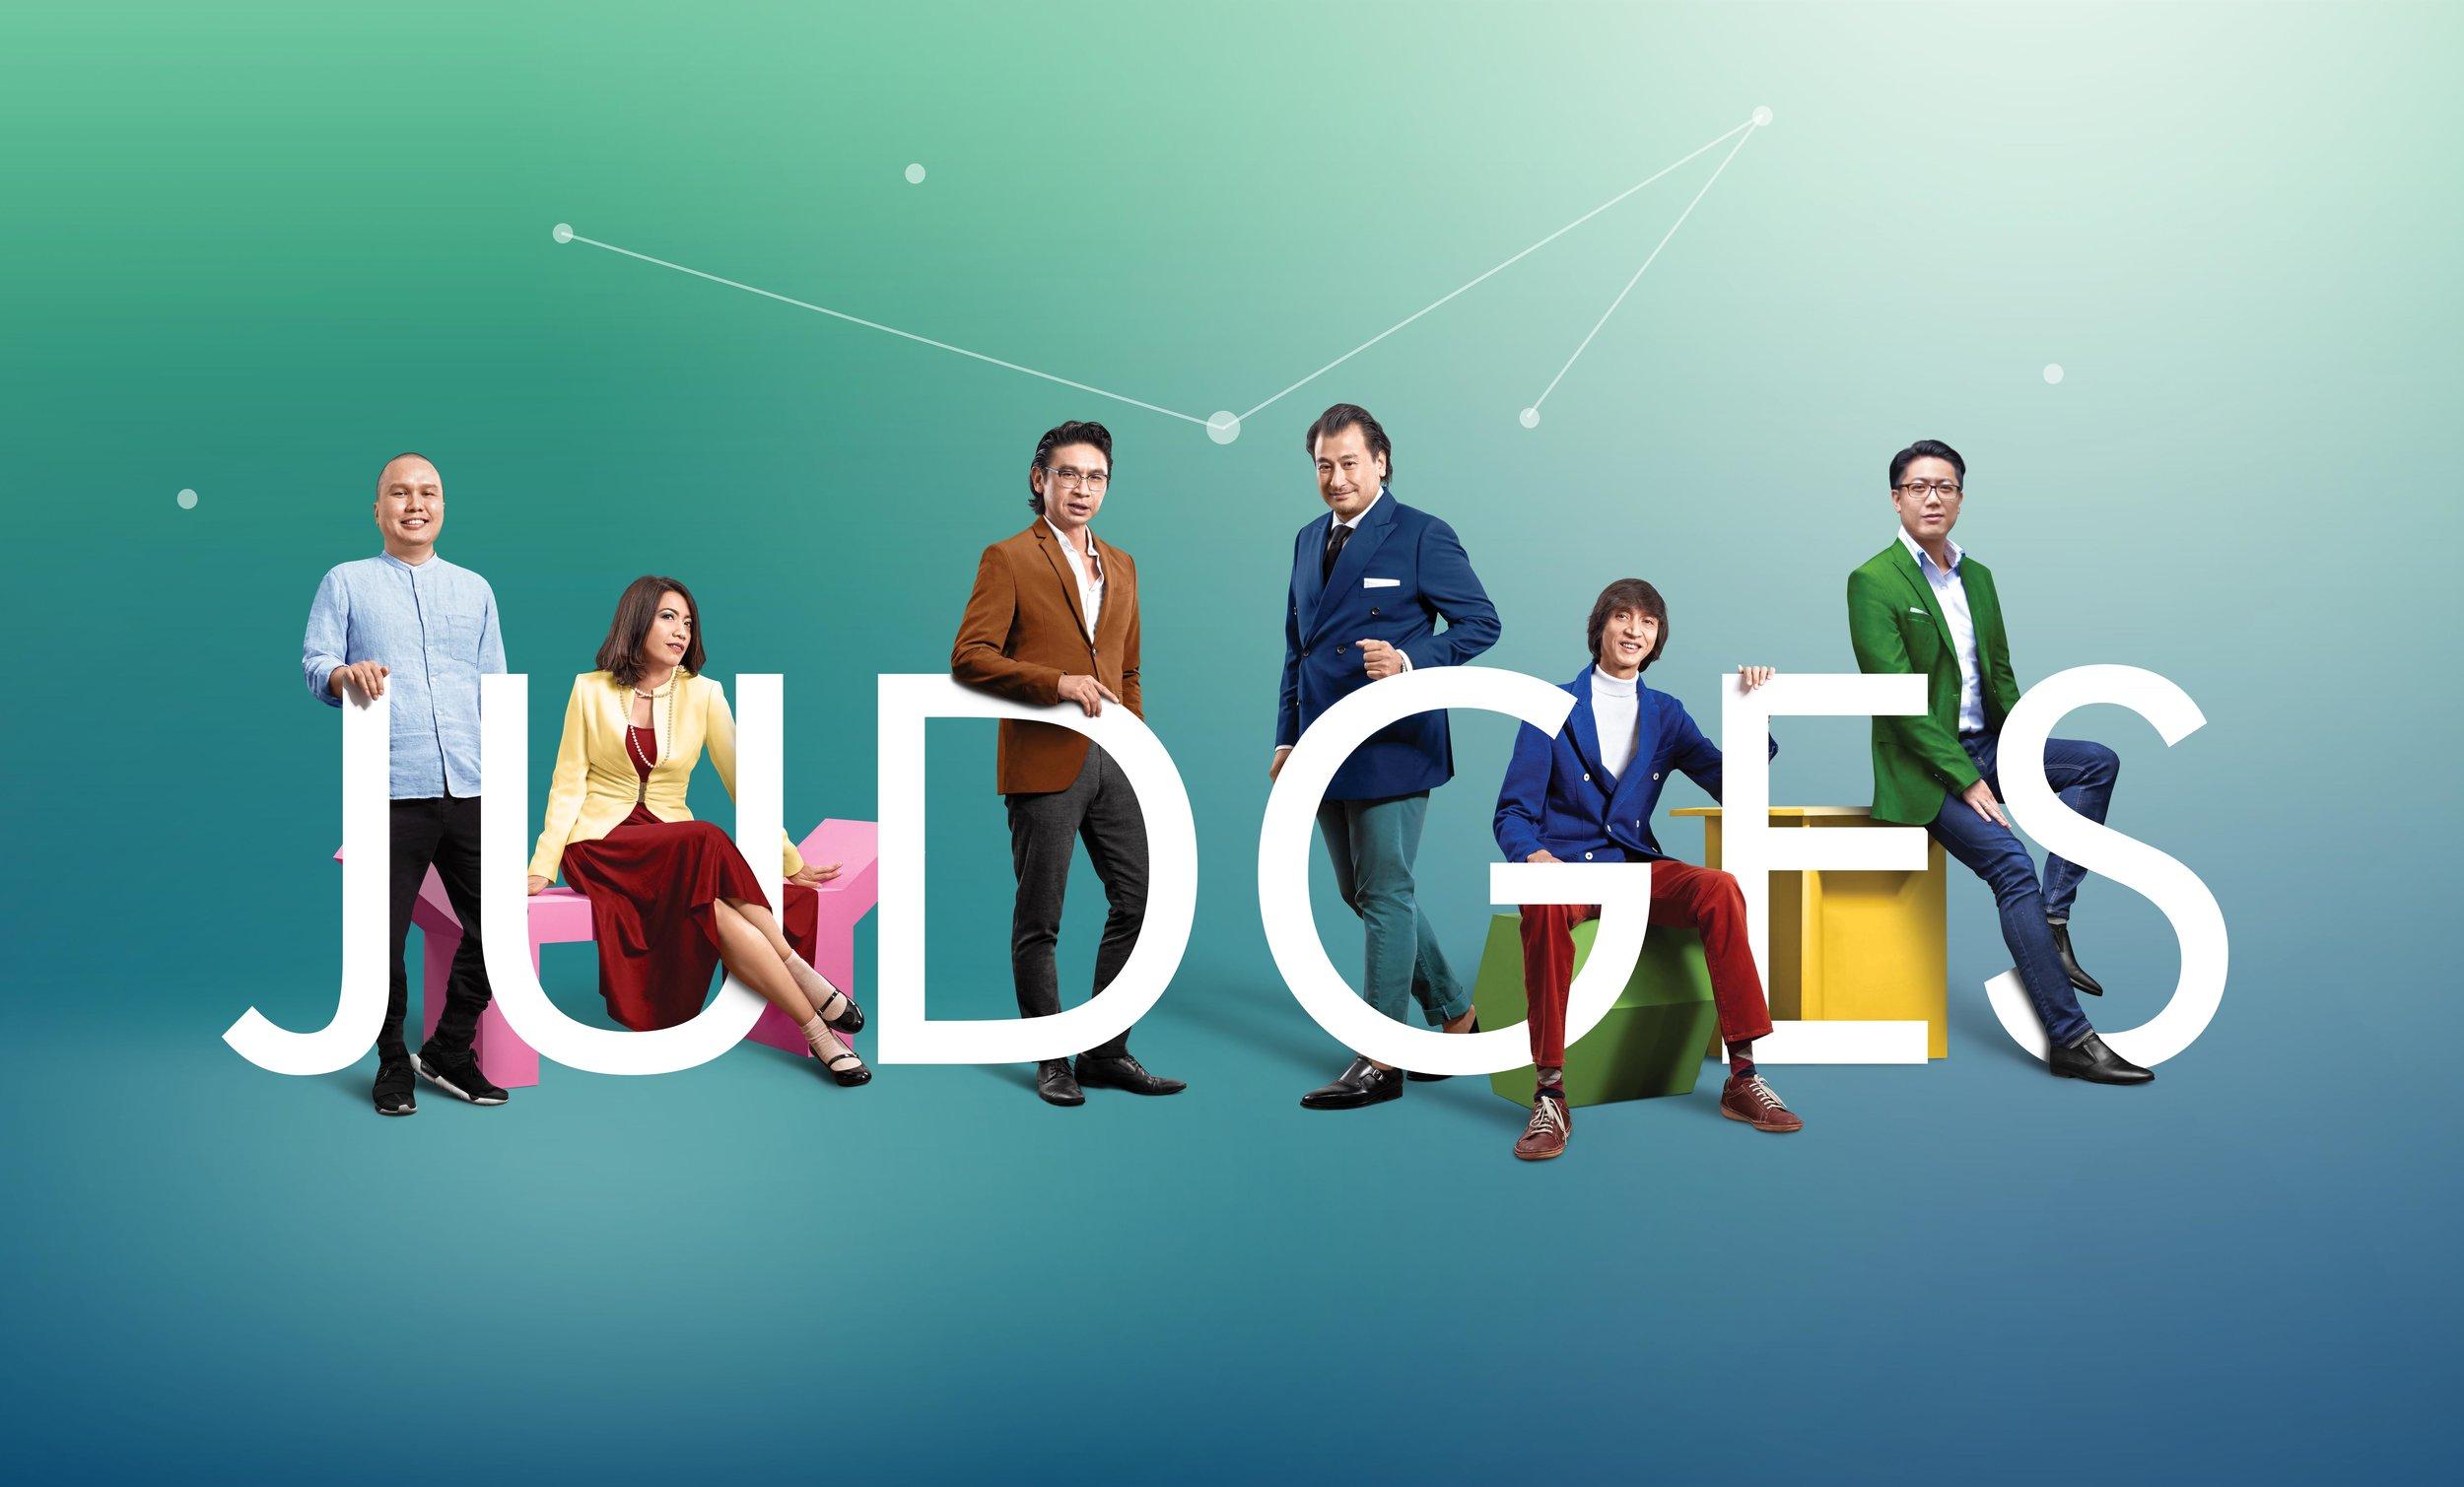 JWT Judges.jpg